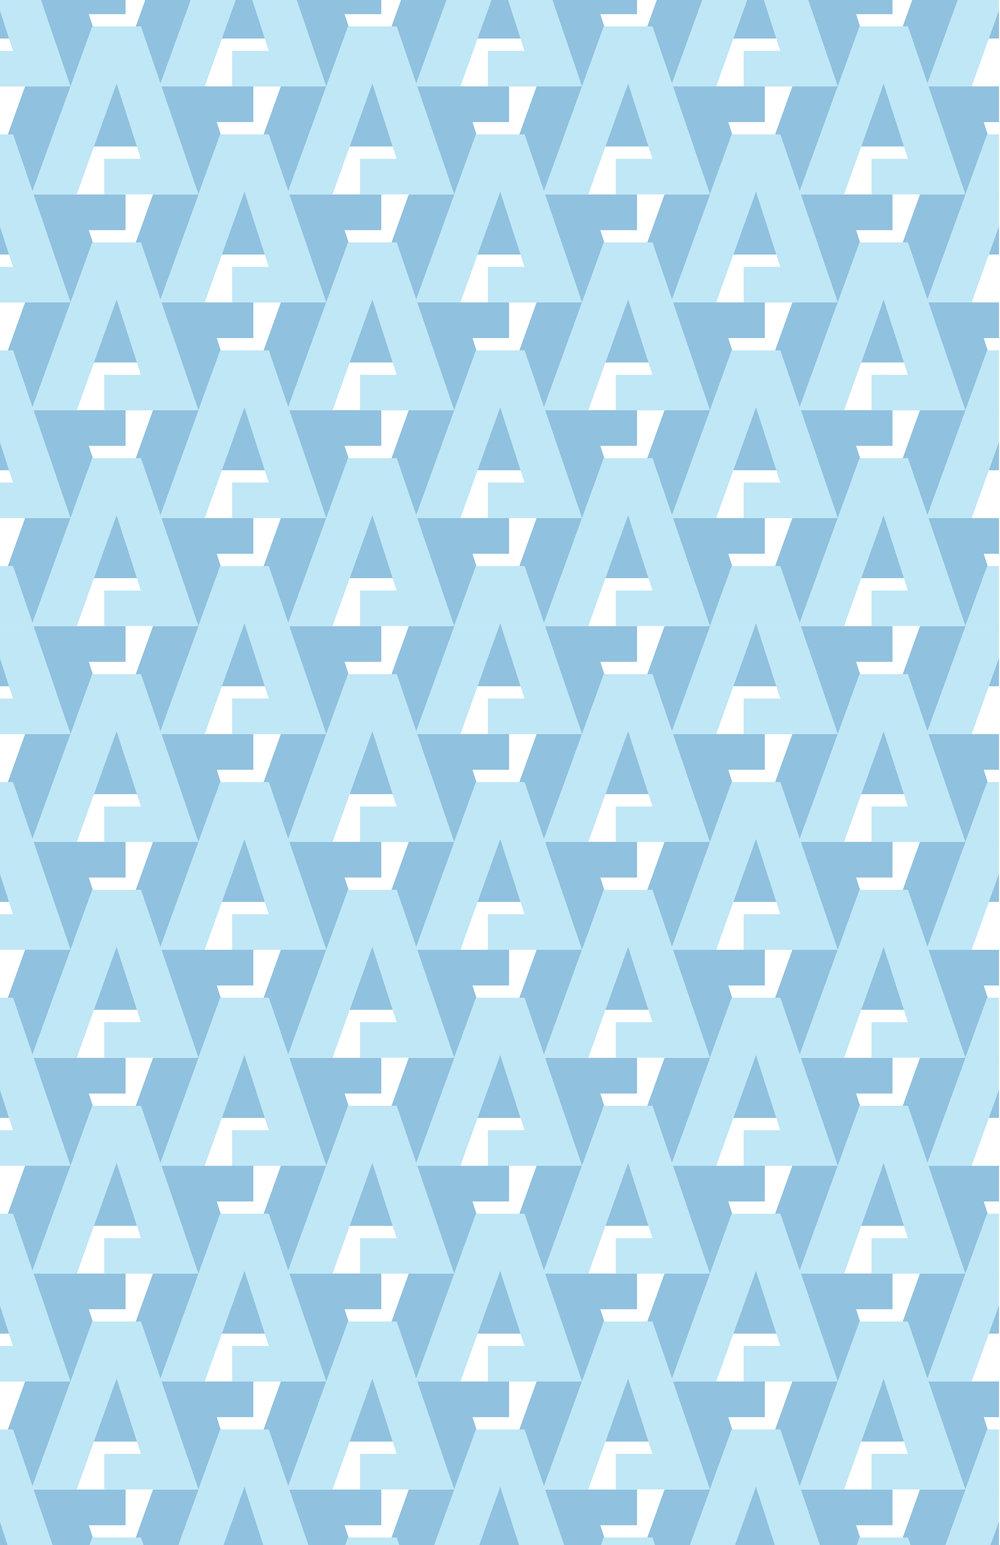 pattern1-01.jpg